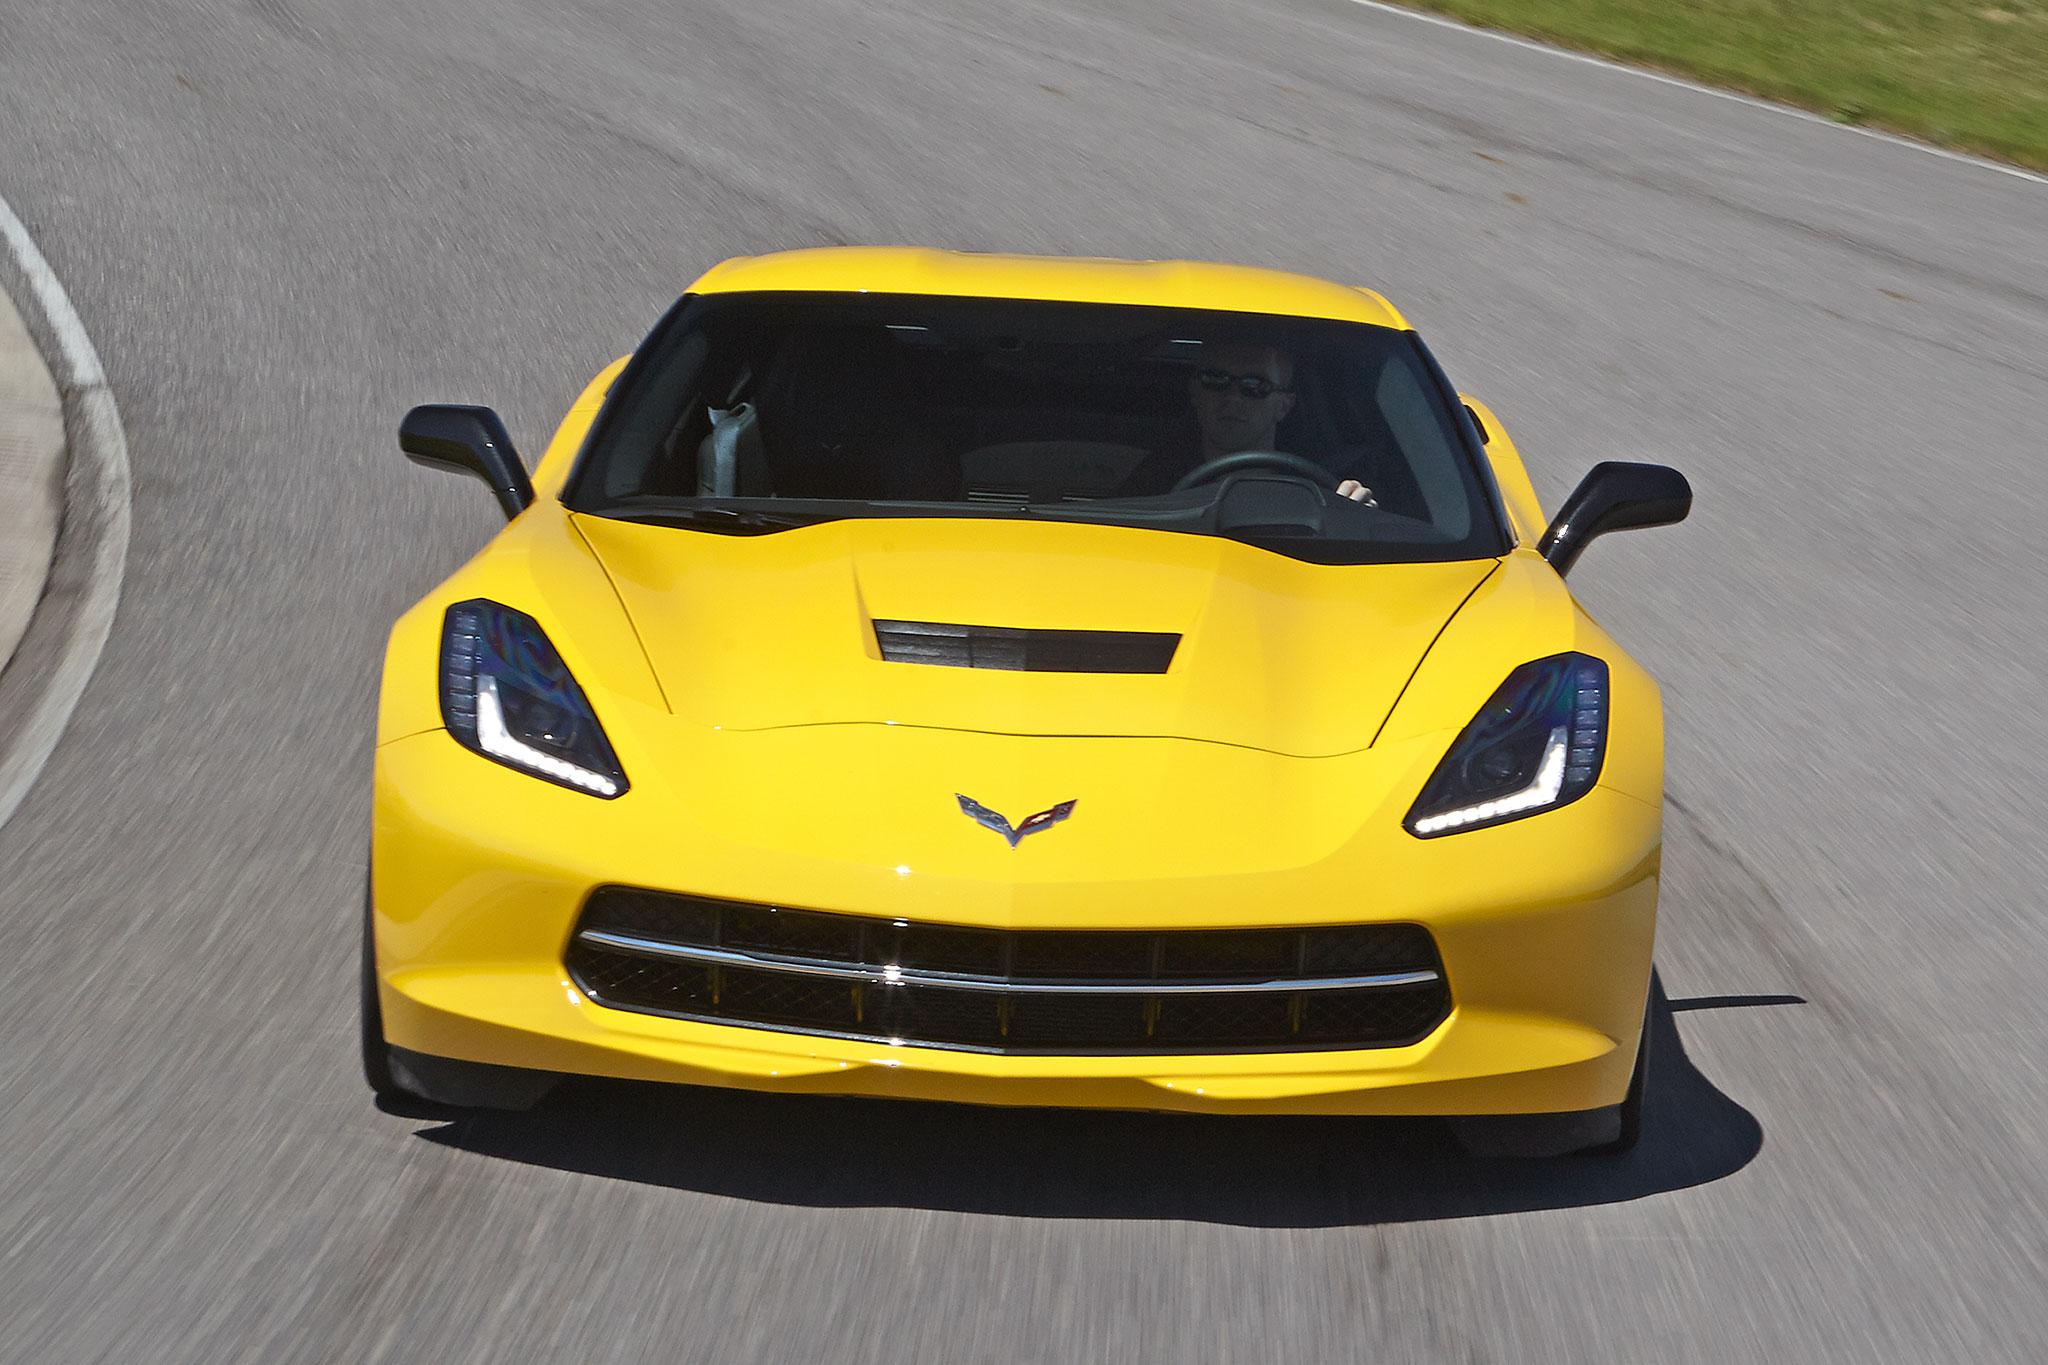 2015 chevrolet corvette stingray order guide leaks automobile. Black Bedroom Furniture Sets. Home Design Ideas